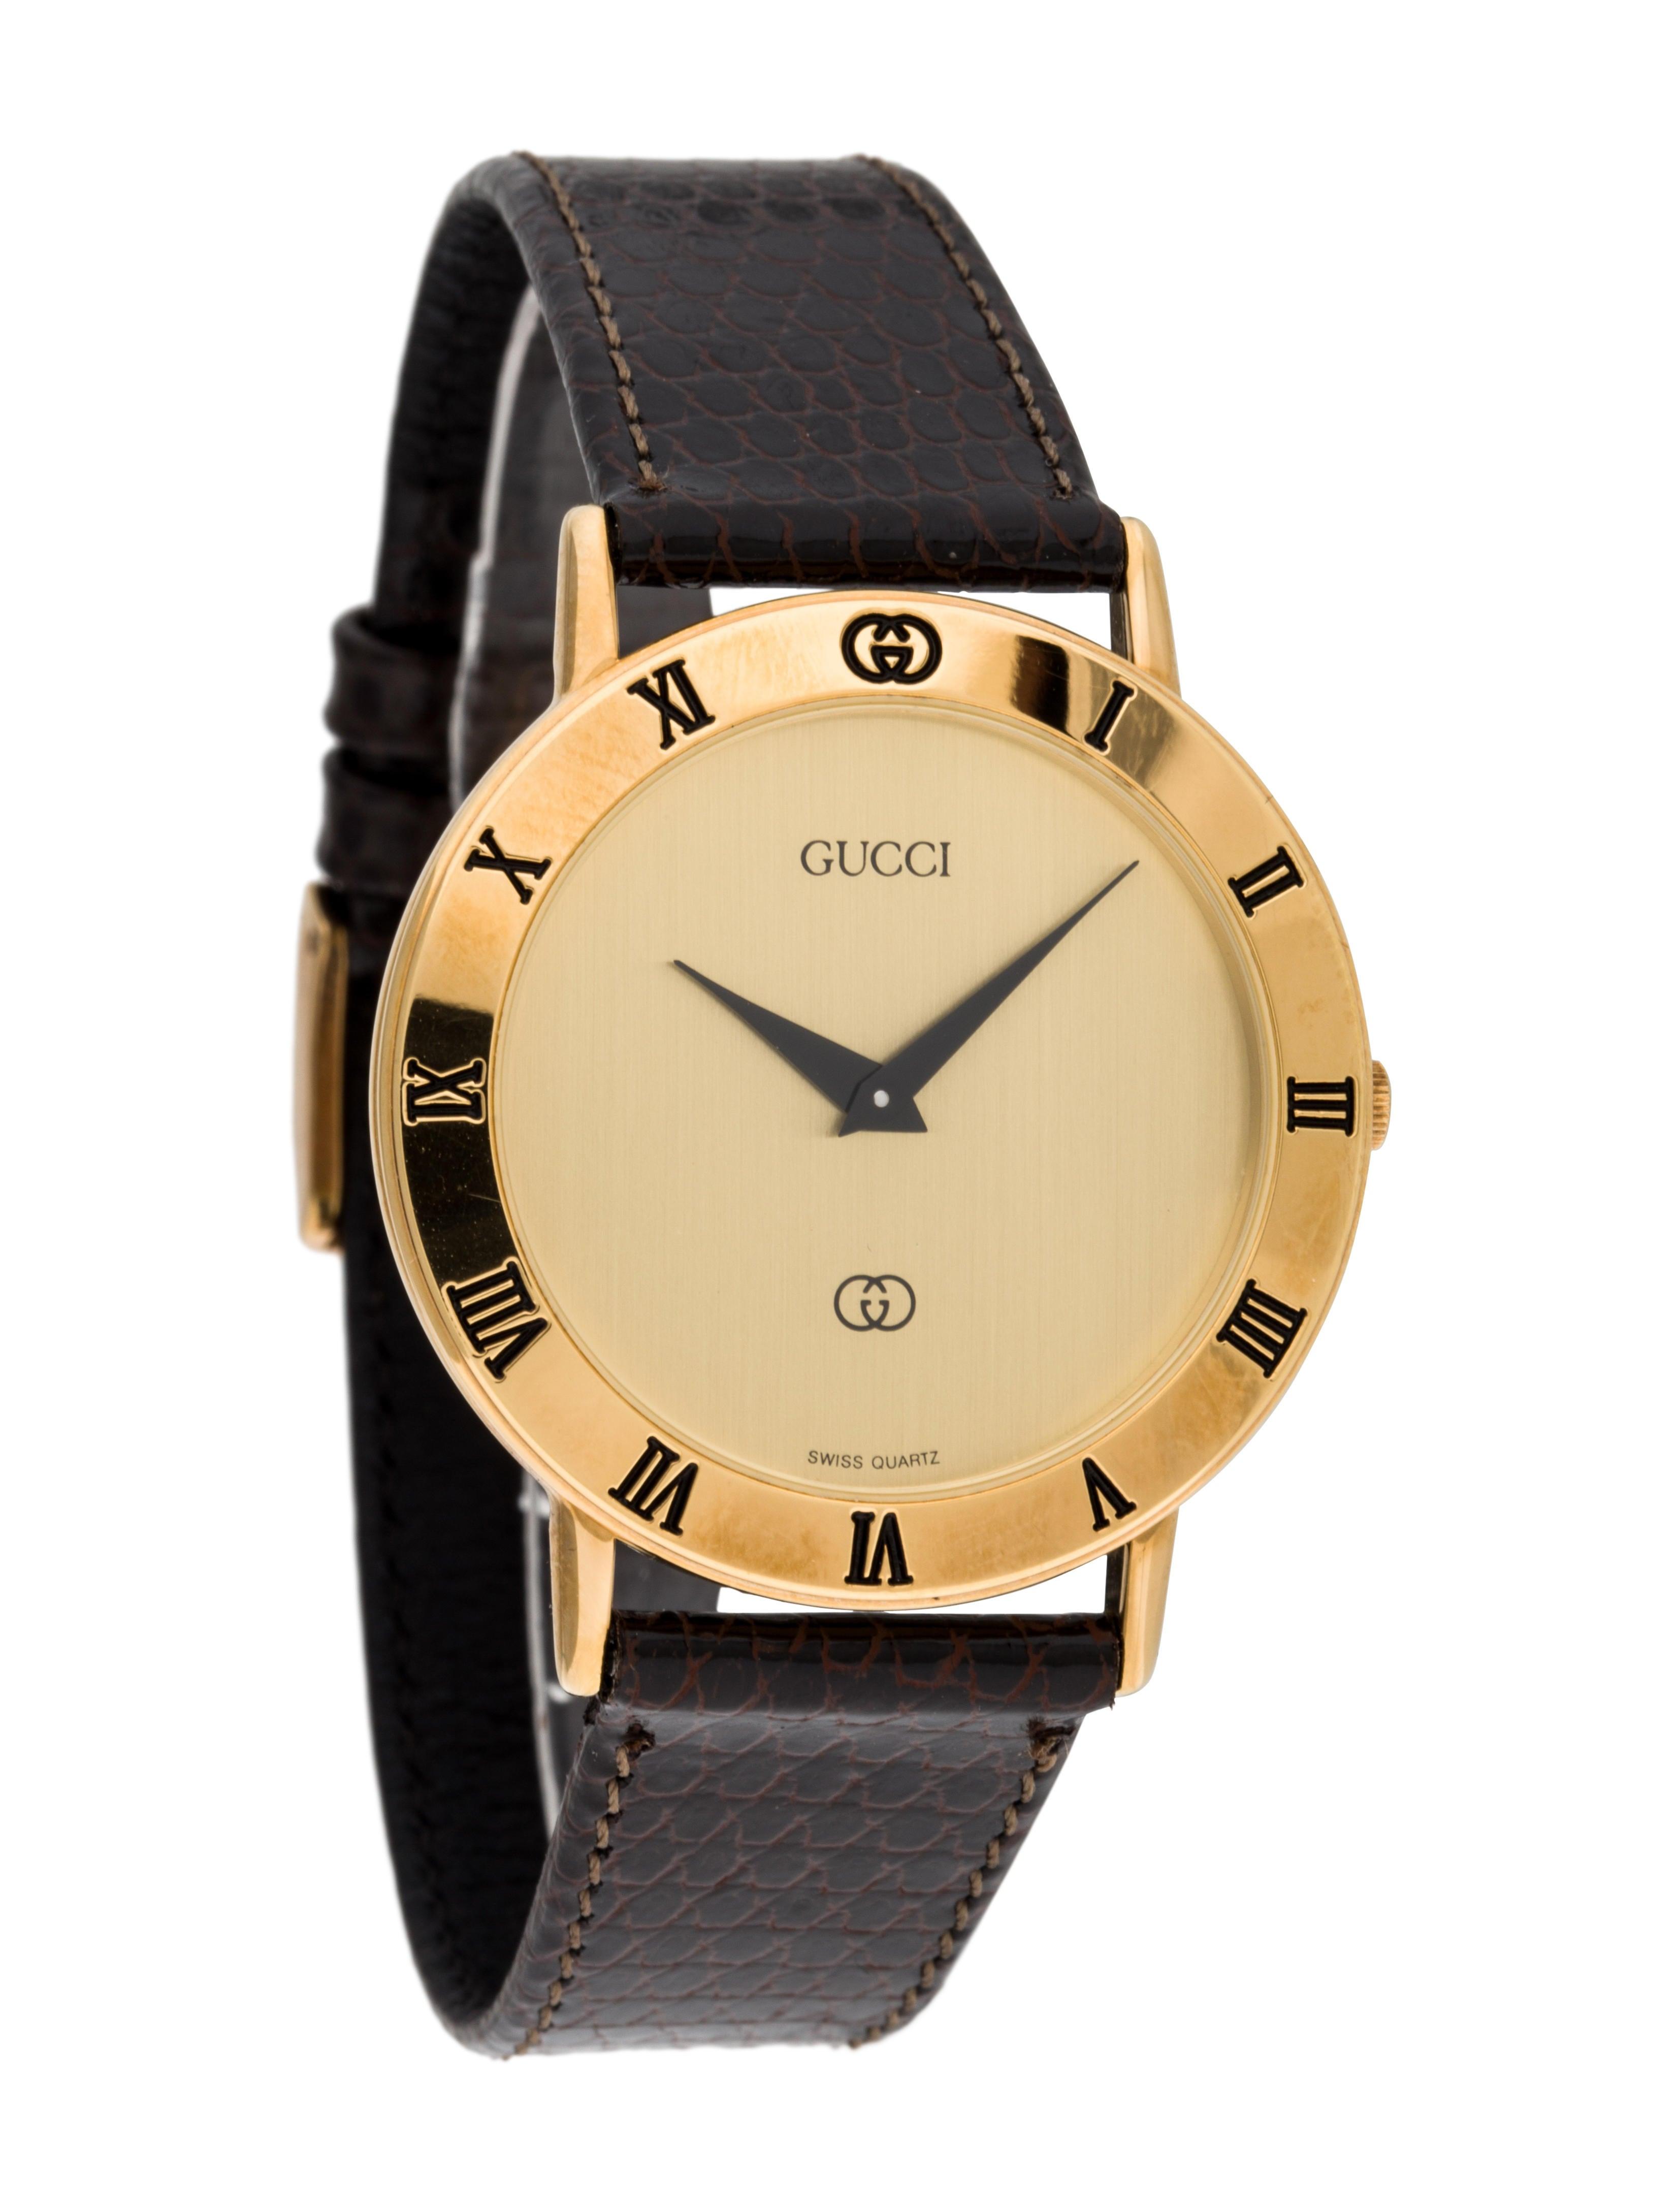 58eefa8d0b4 Gucci 3000M Watch - Strap - GUC80013